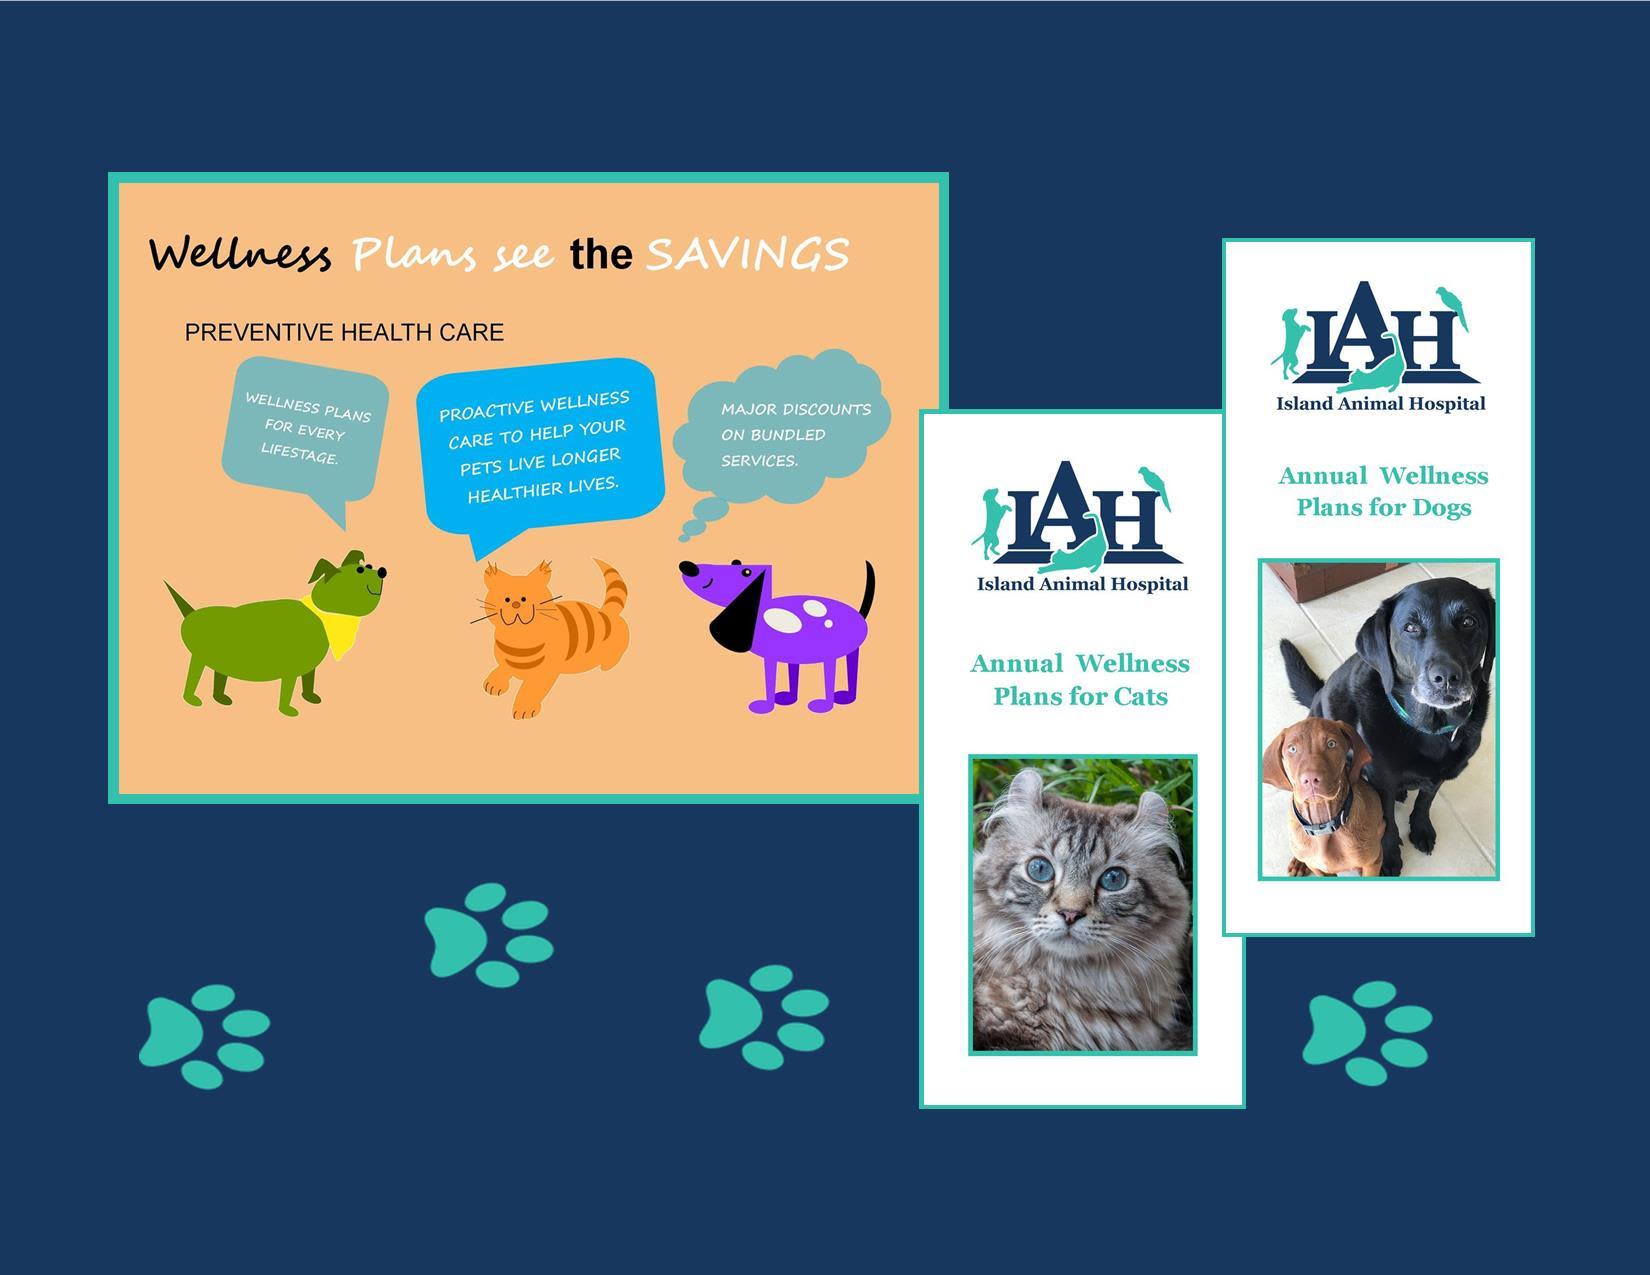 Managing your pet's health at St. Simons Island Animal Hospital